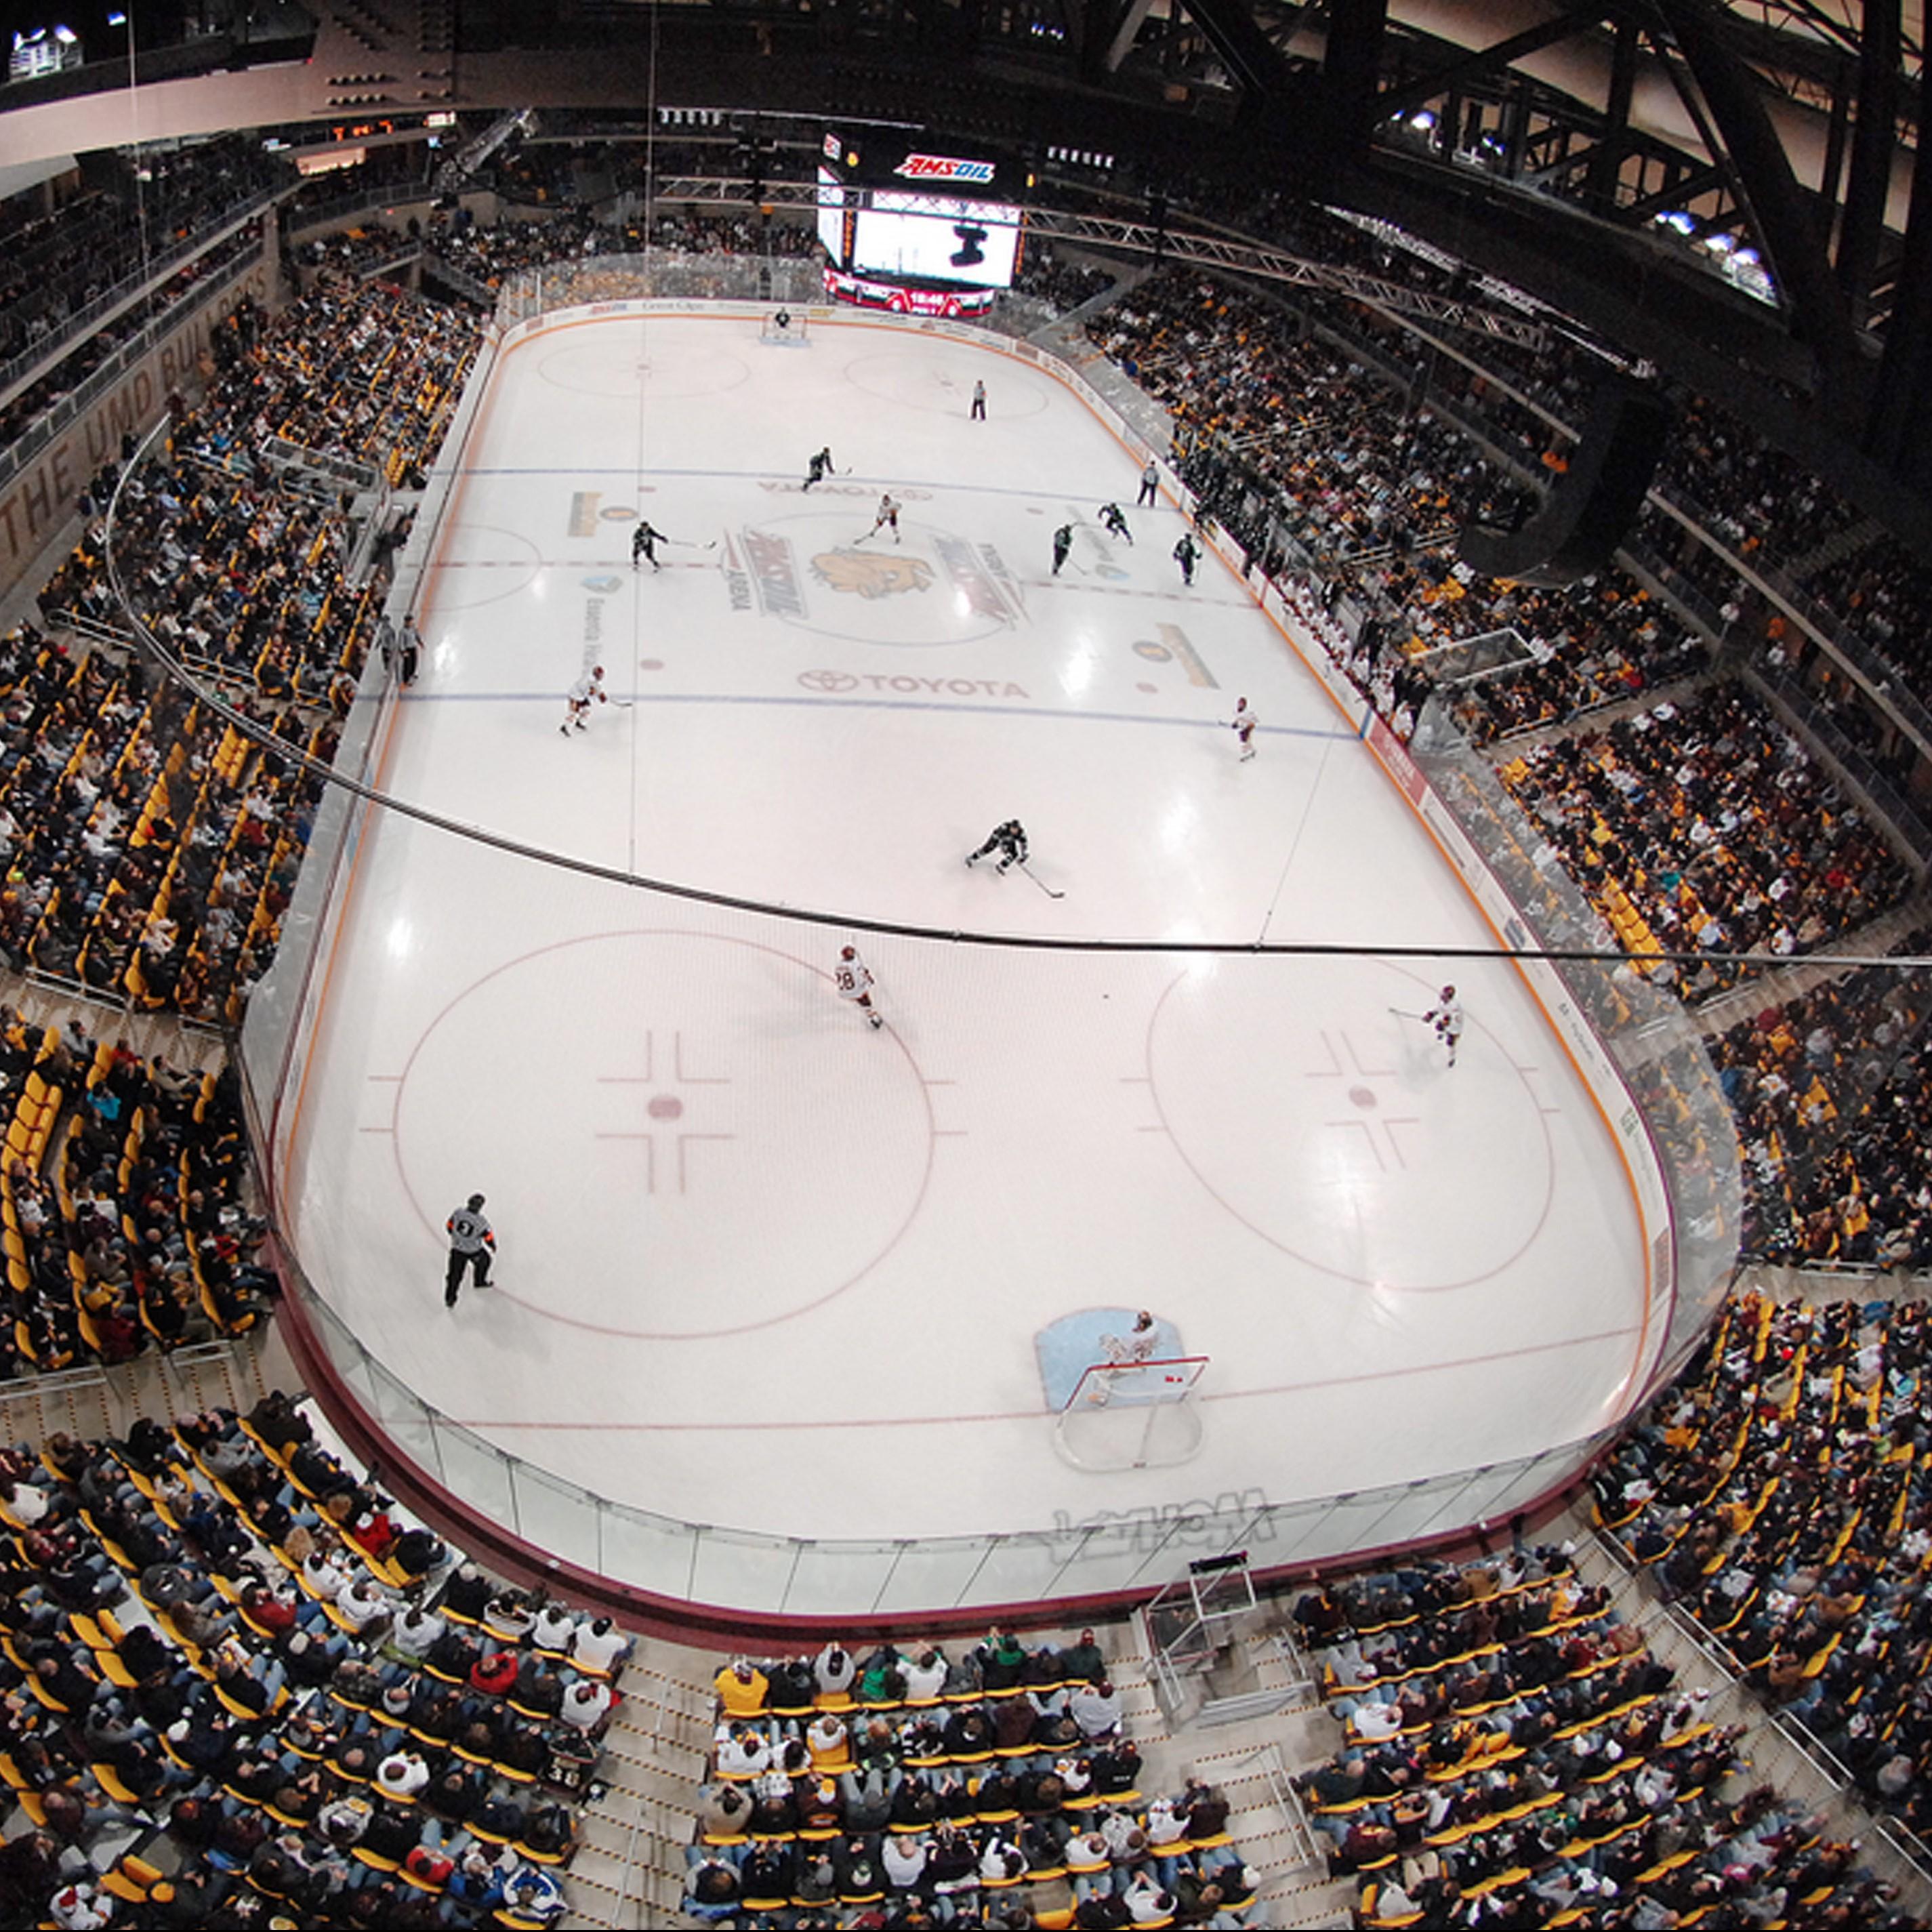 Hockey game inside Amsoil Arena